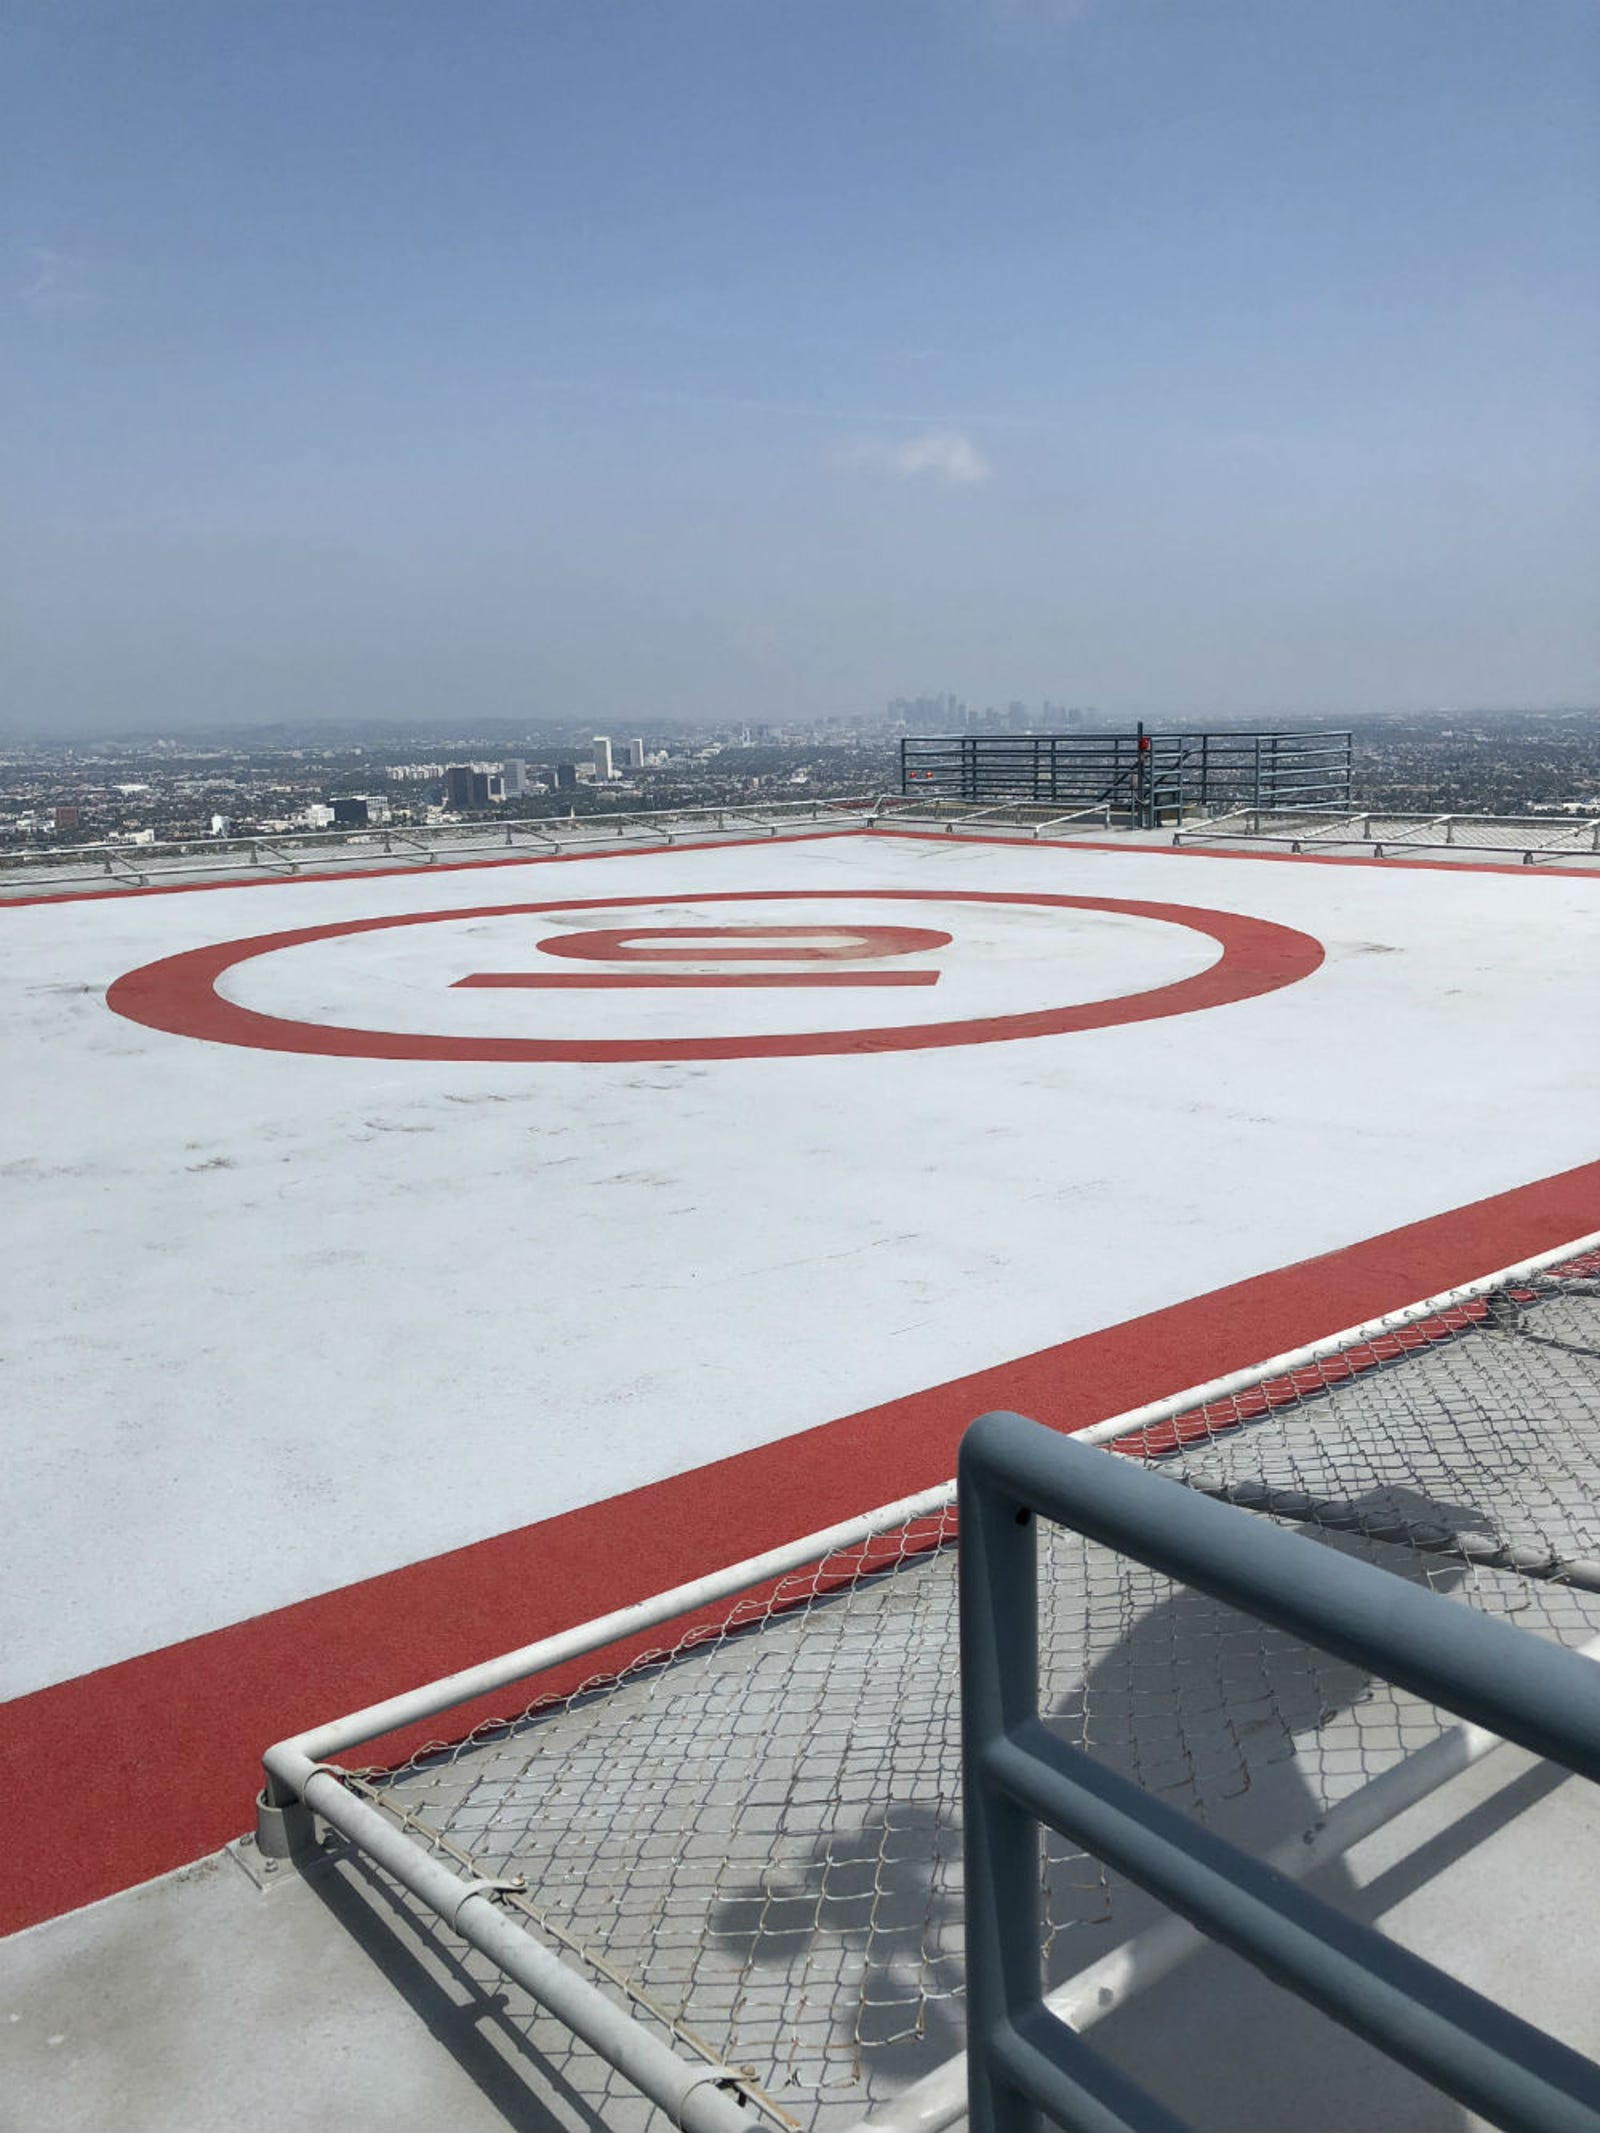 The roof of Nakatomi Plaza, minus explosives.